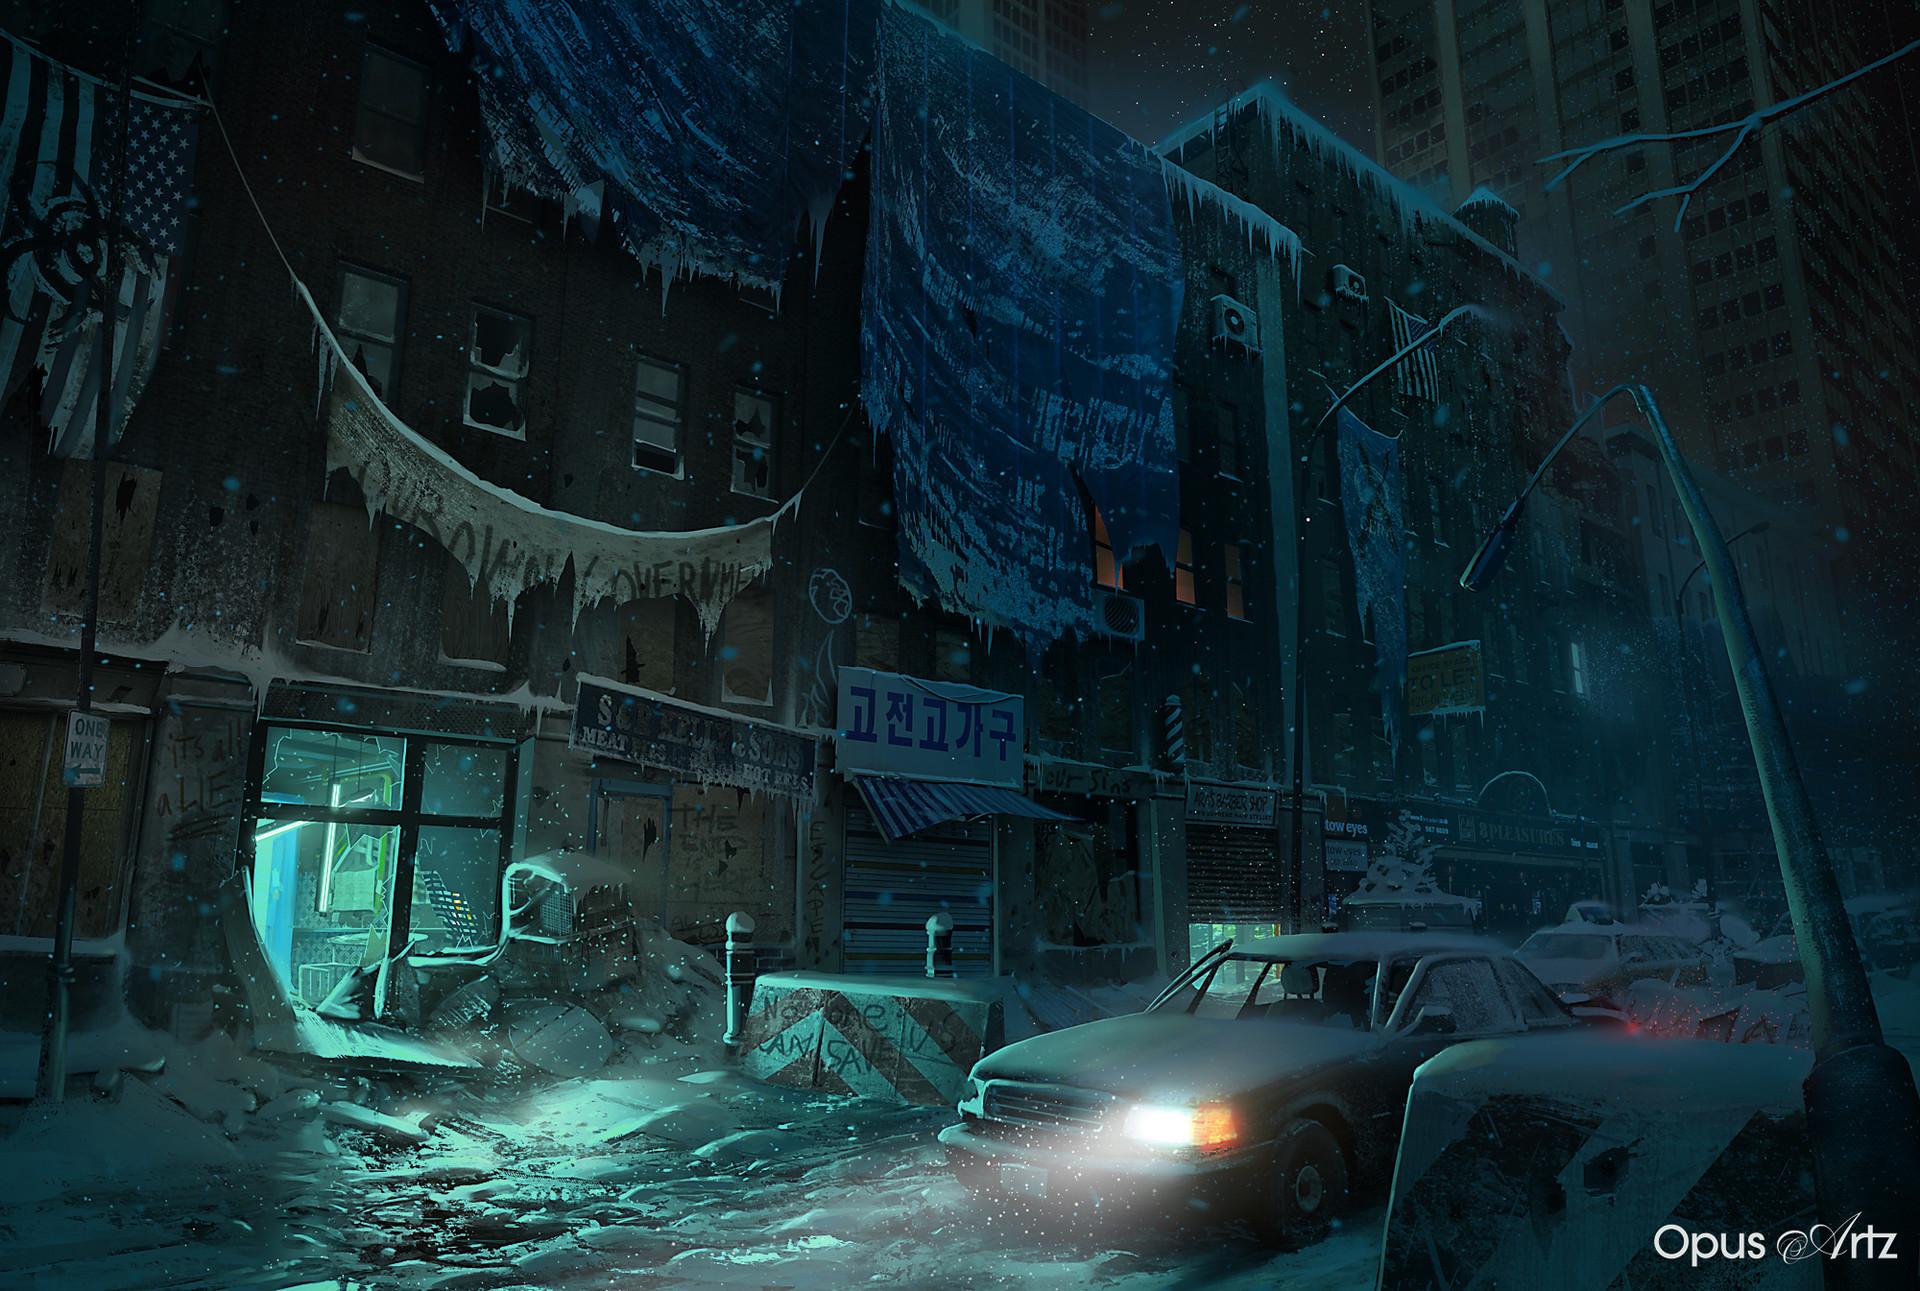 Opus artz divison chaos night neon finalflat